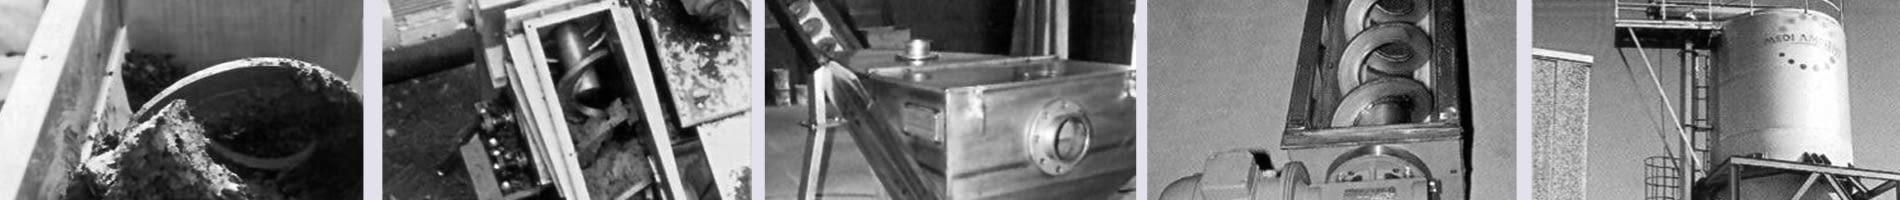 Banner-Transportador para lodos